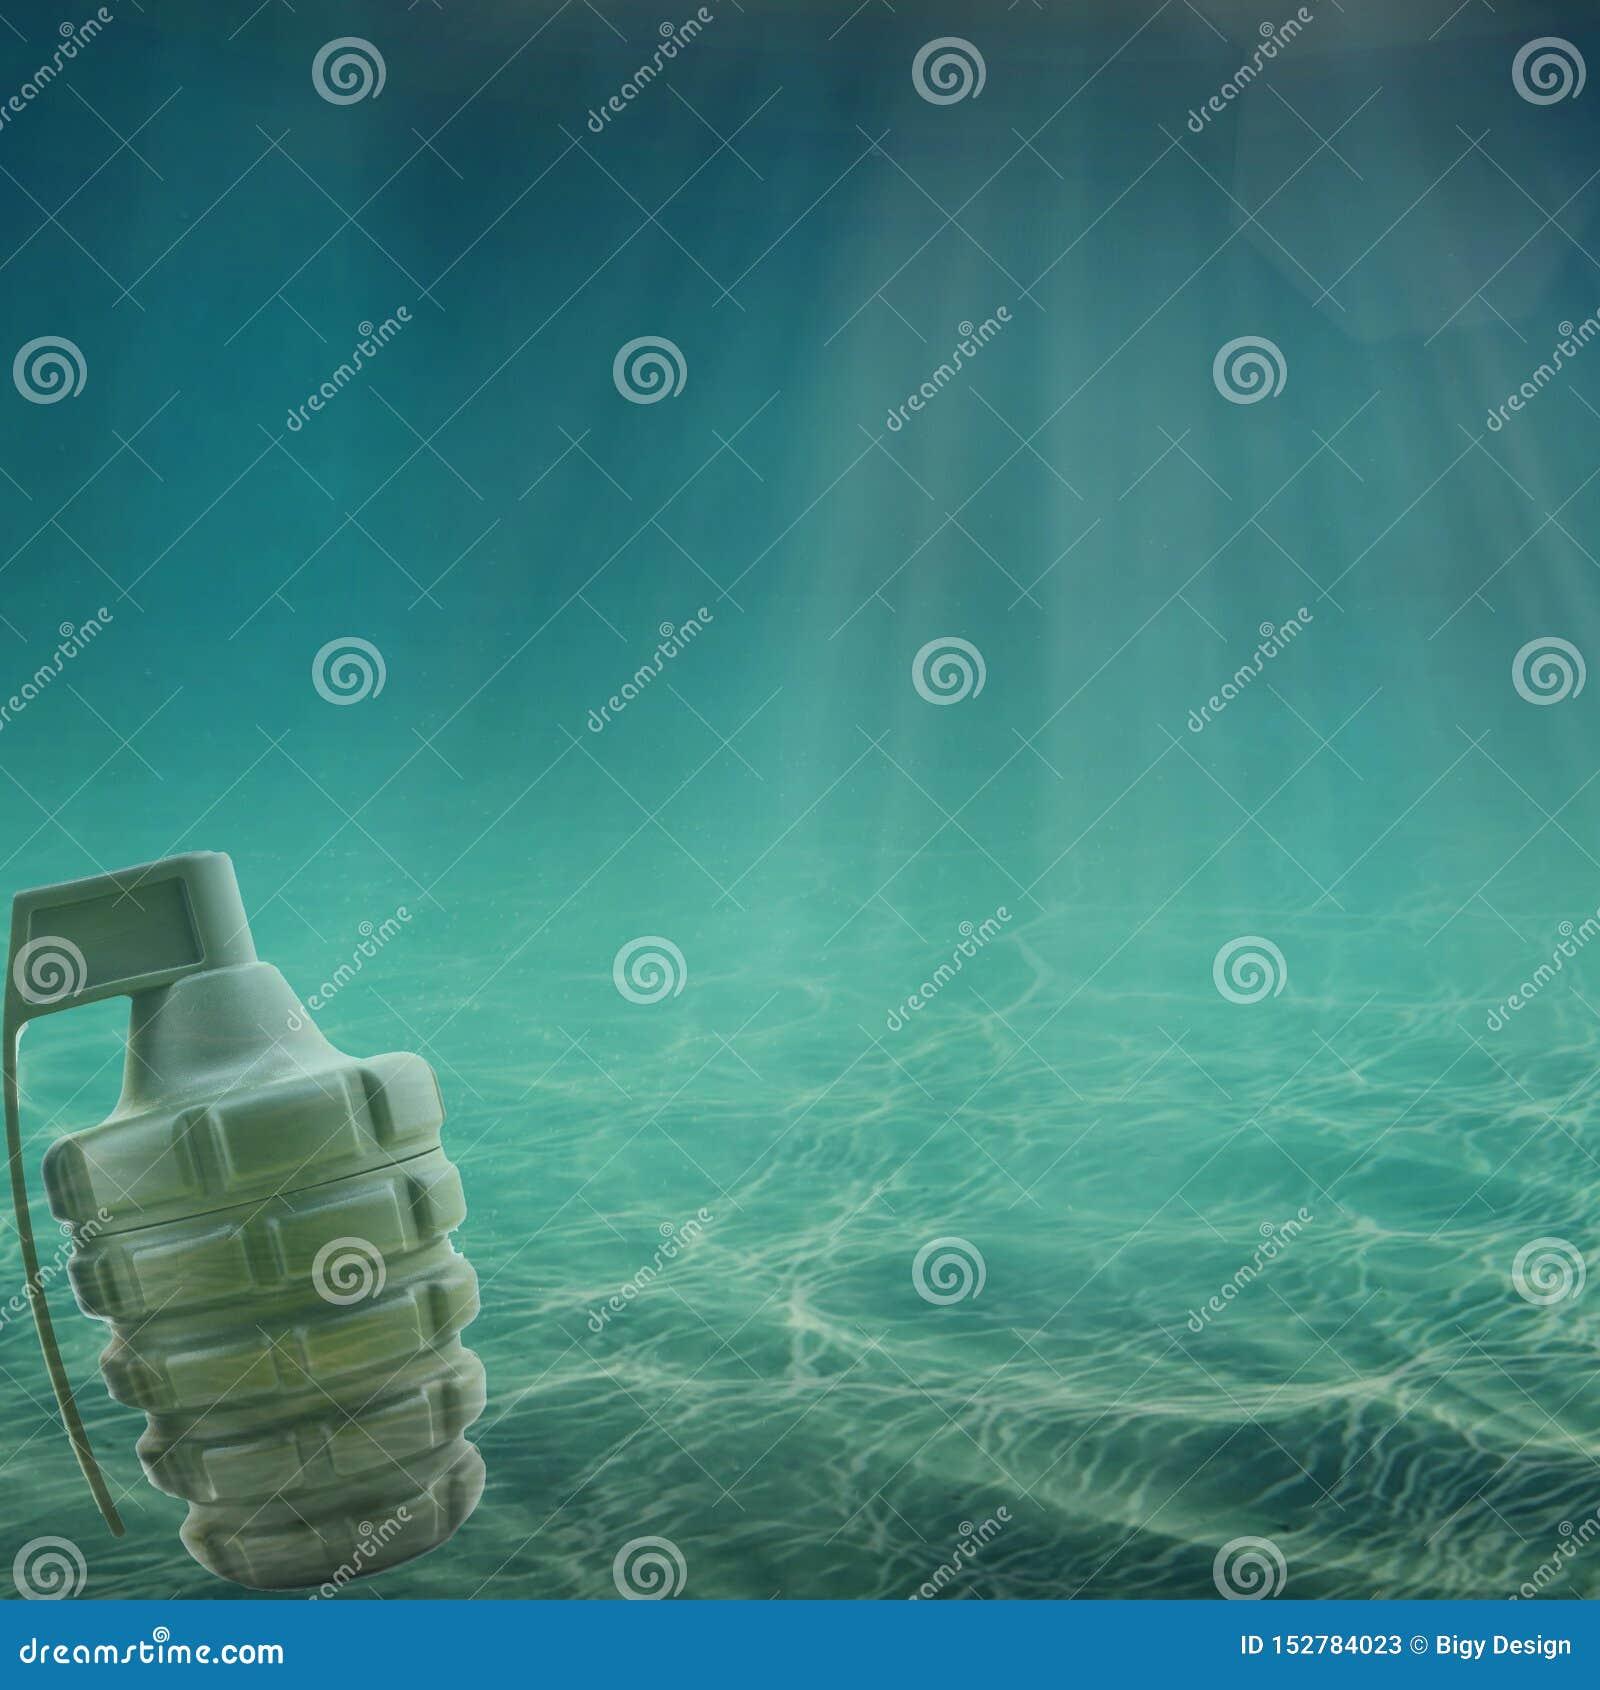 Grenade in the sea or ocean. Oil War